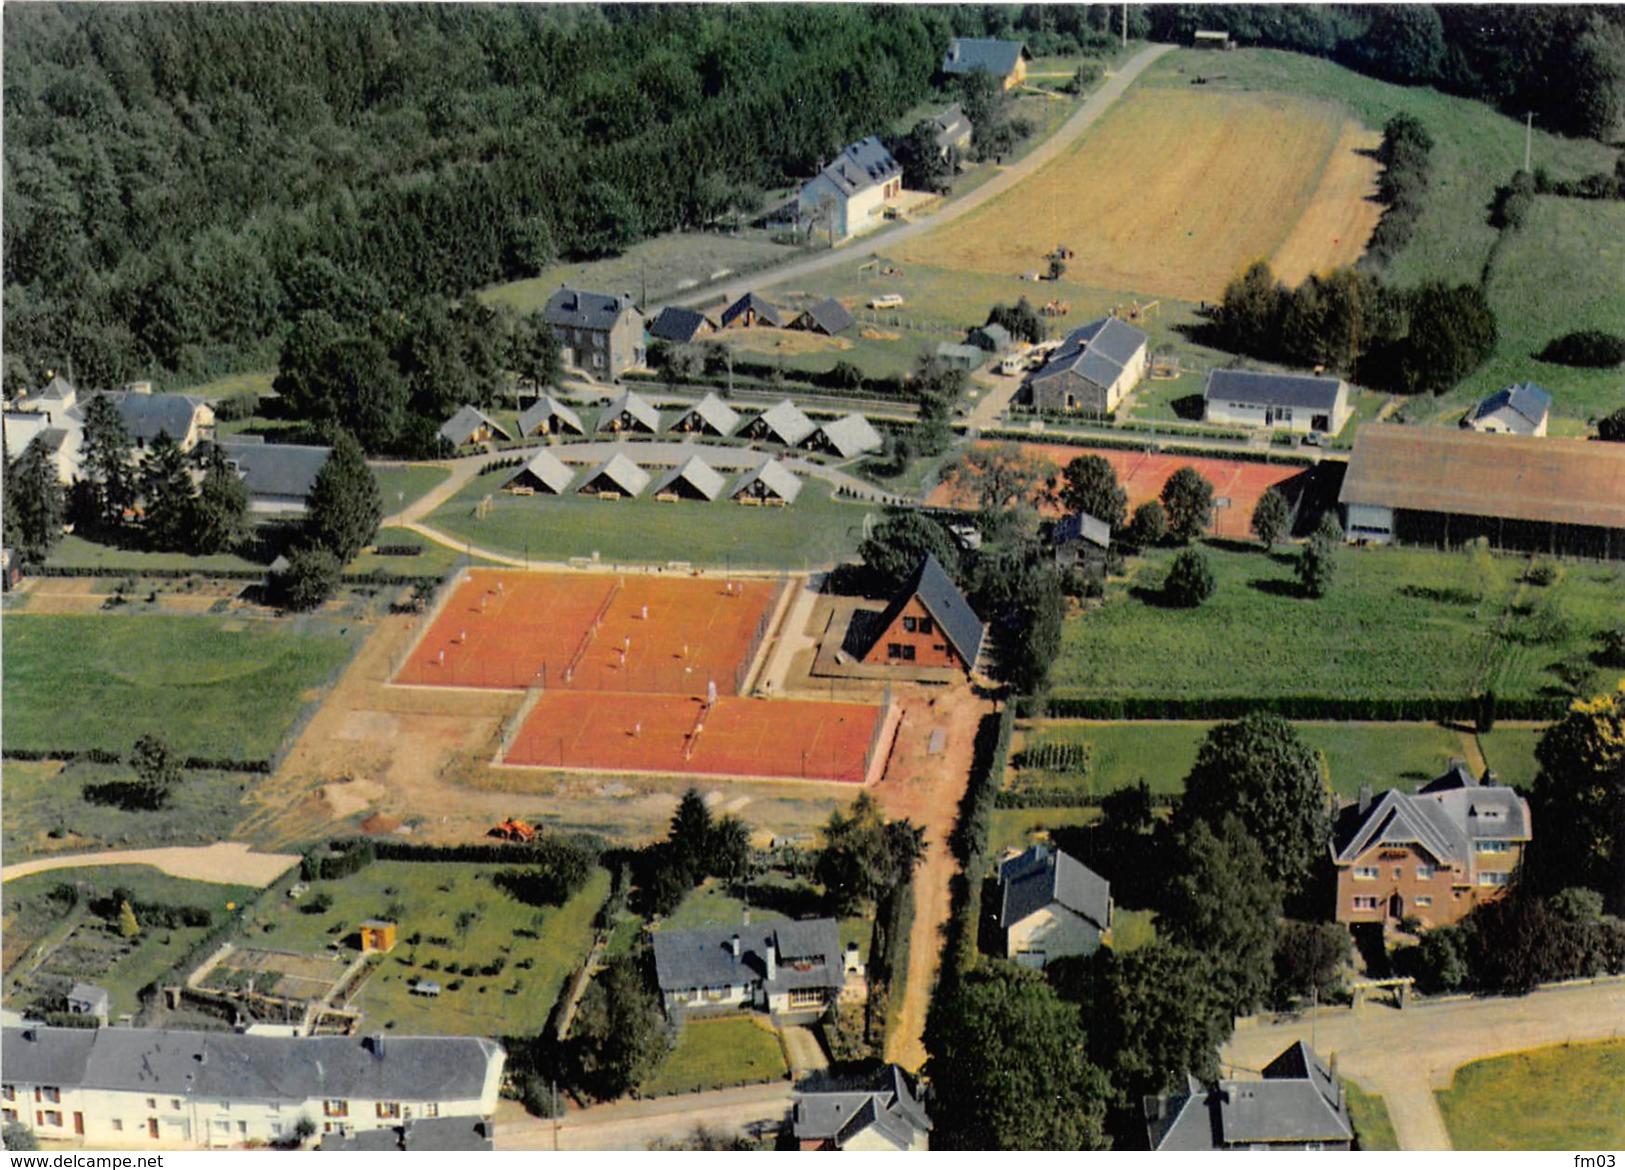 Chiny Centre Du Liry ADEPS Tennis Tirage Plus Ancien - Chiny